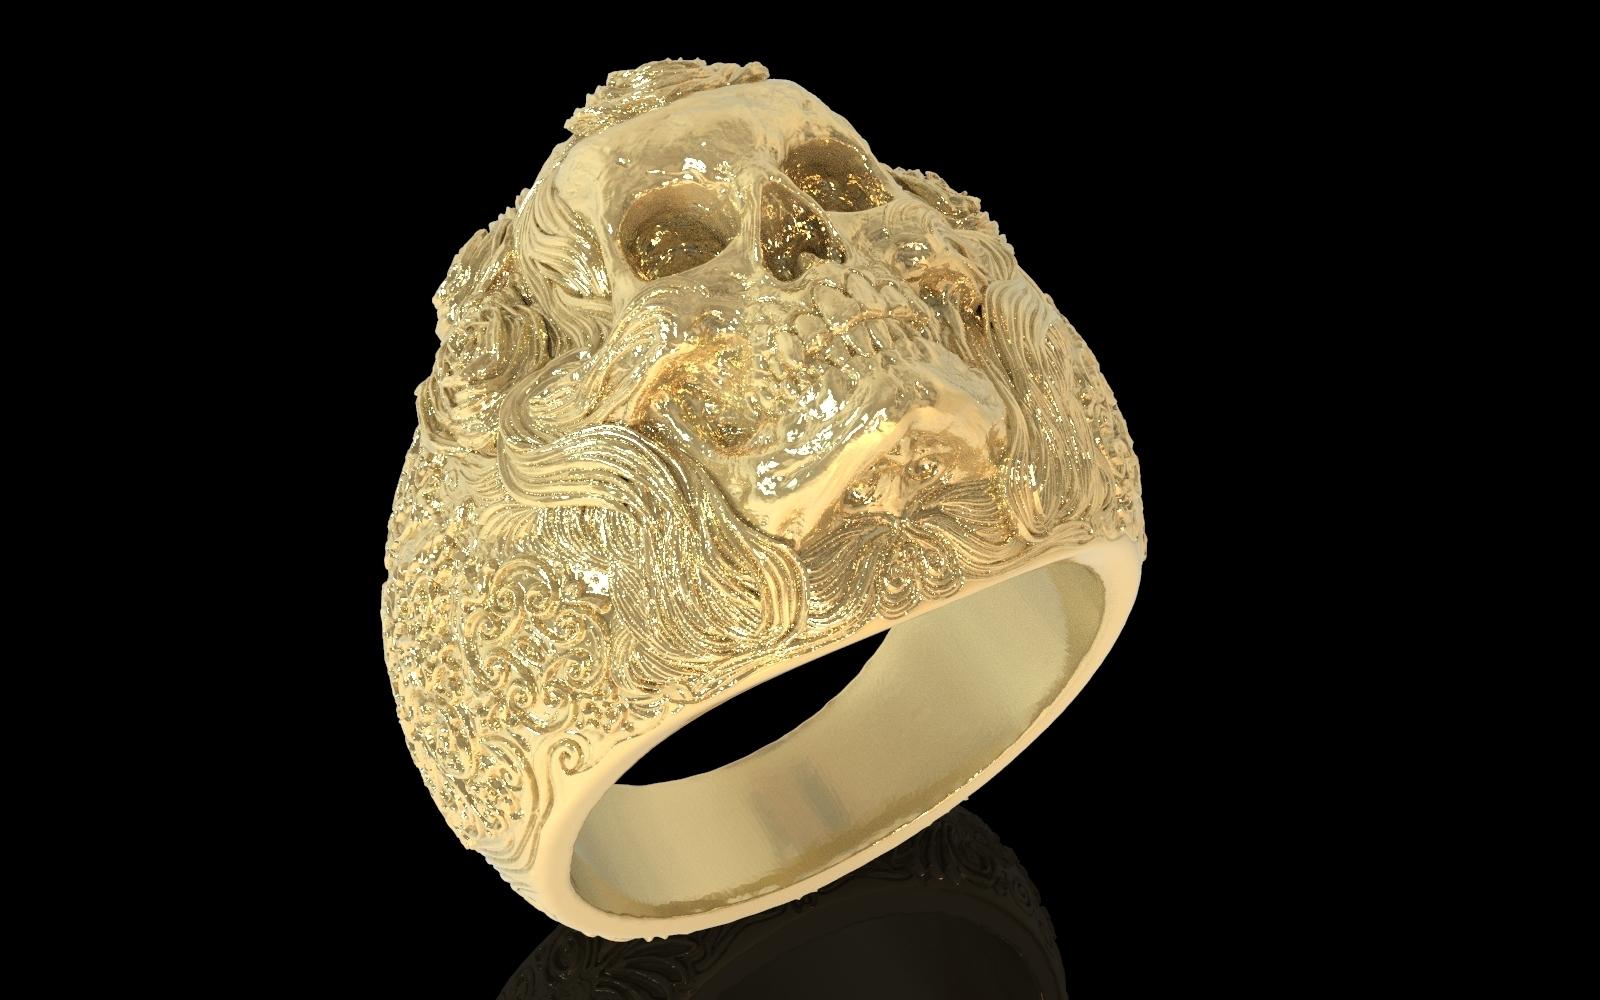 3.jpg Download free STL file Skull ring jewelry skeleton ring 3D print model • 3D print object, Cadagency